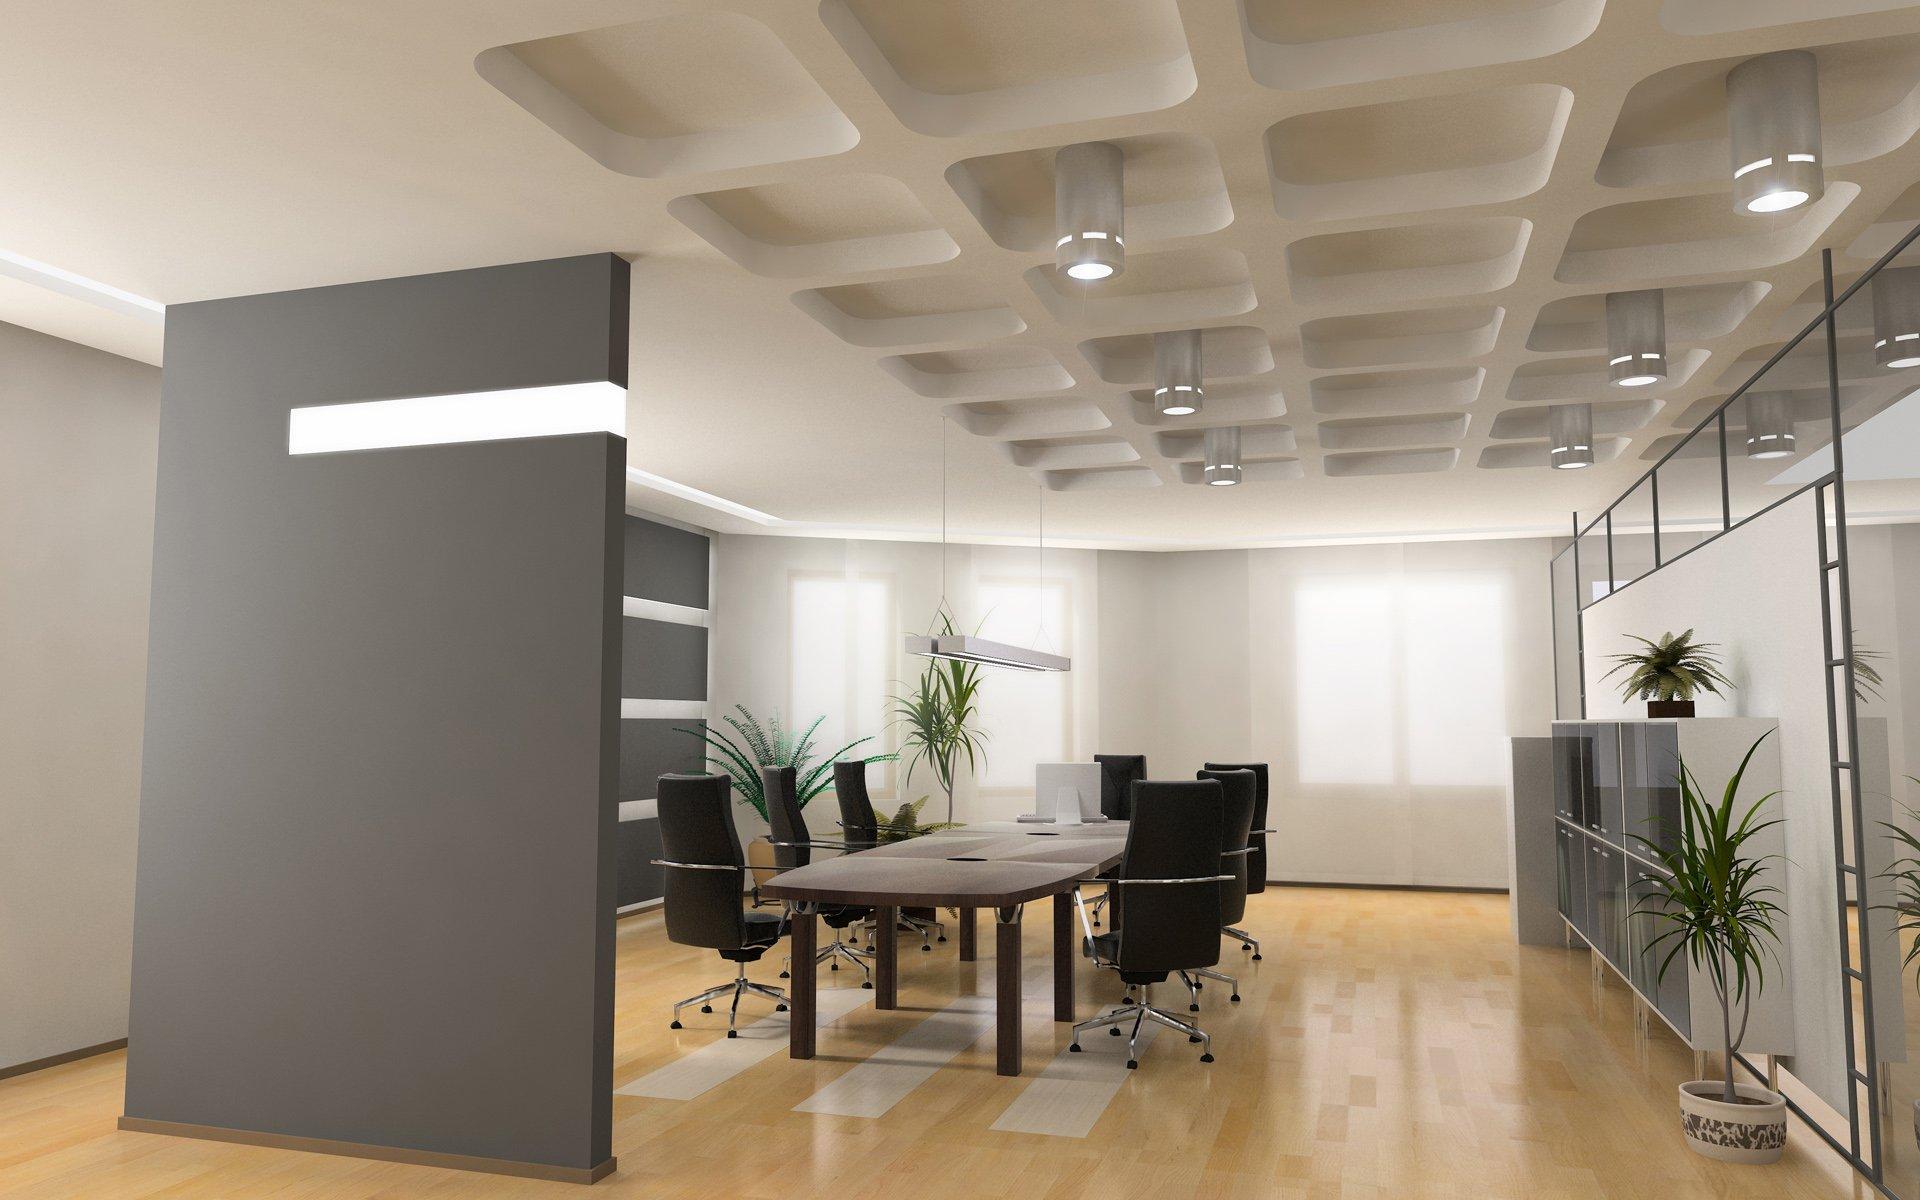 shutterstock_business_office.jpg